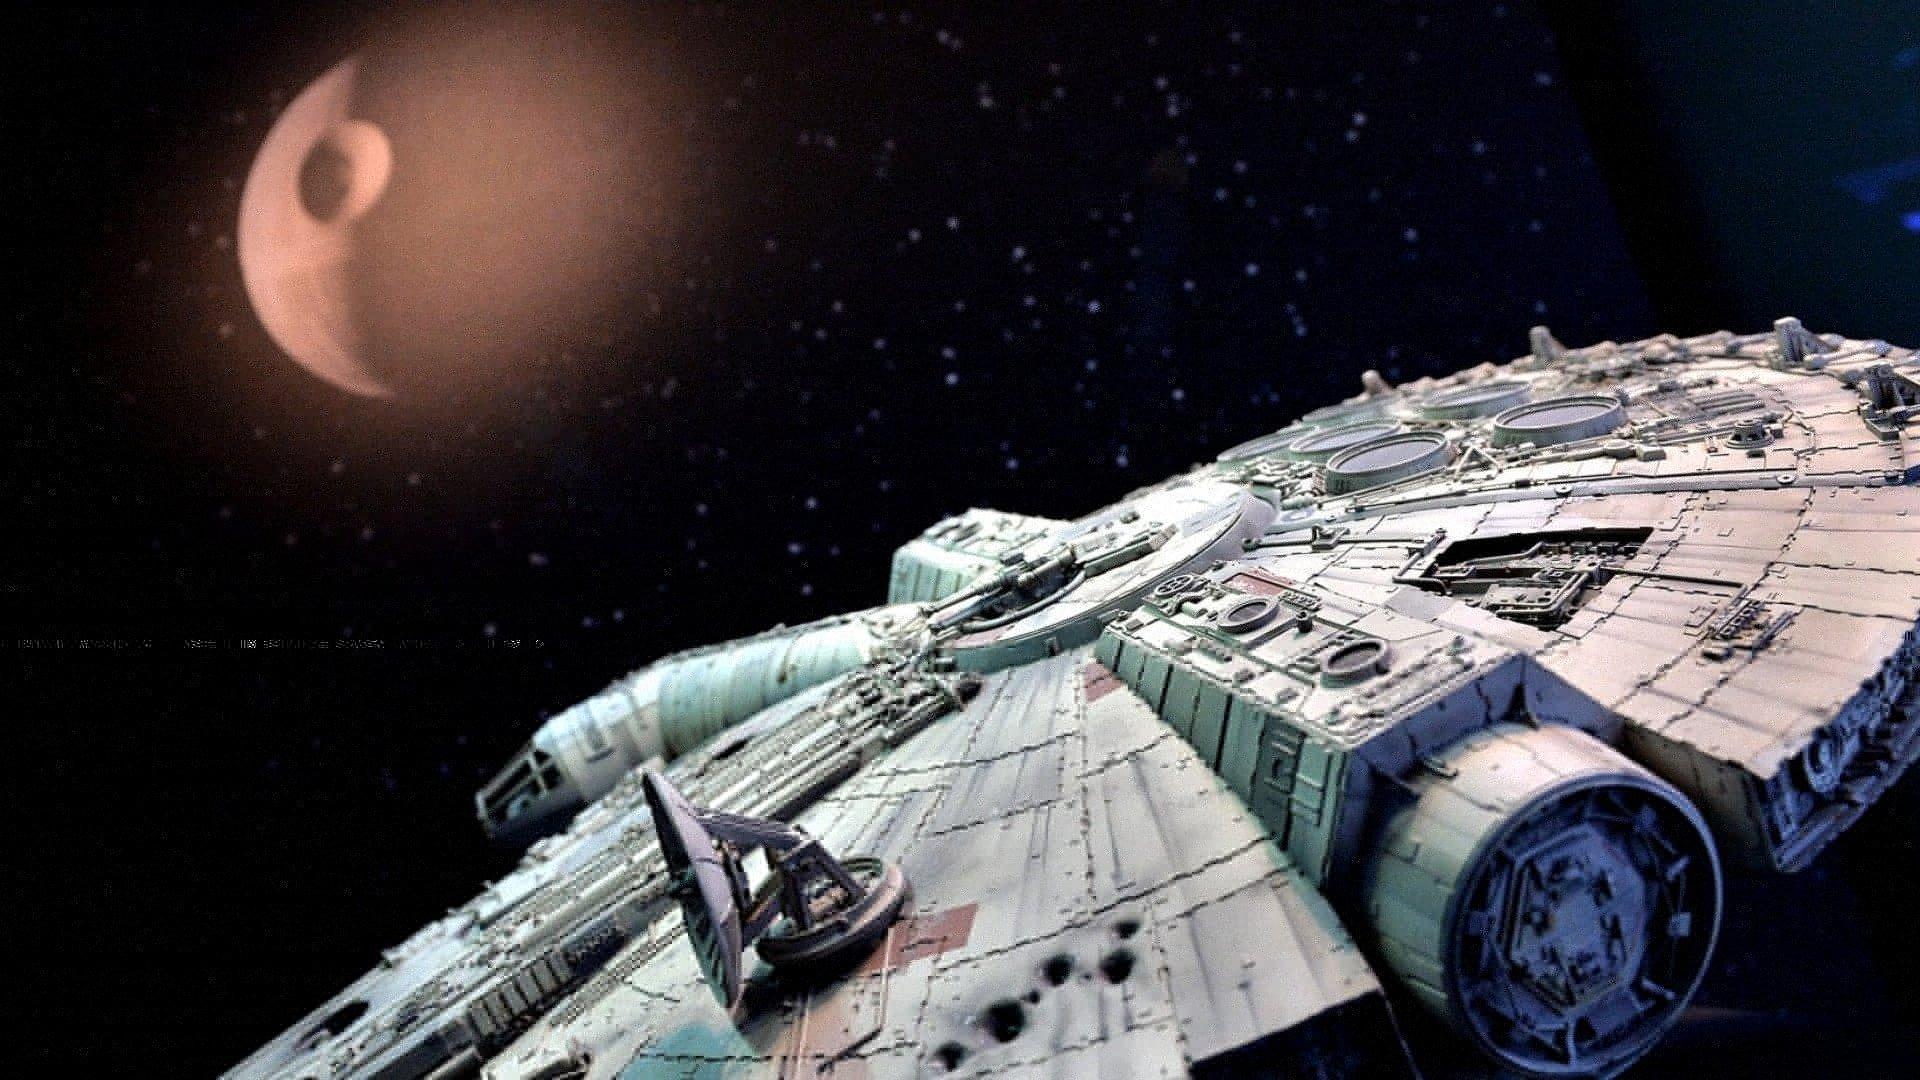 10 Star Wars Quotes Every Entrepreneur Should Memorize